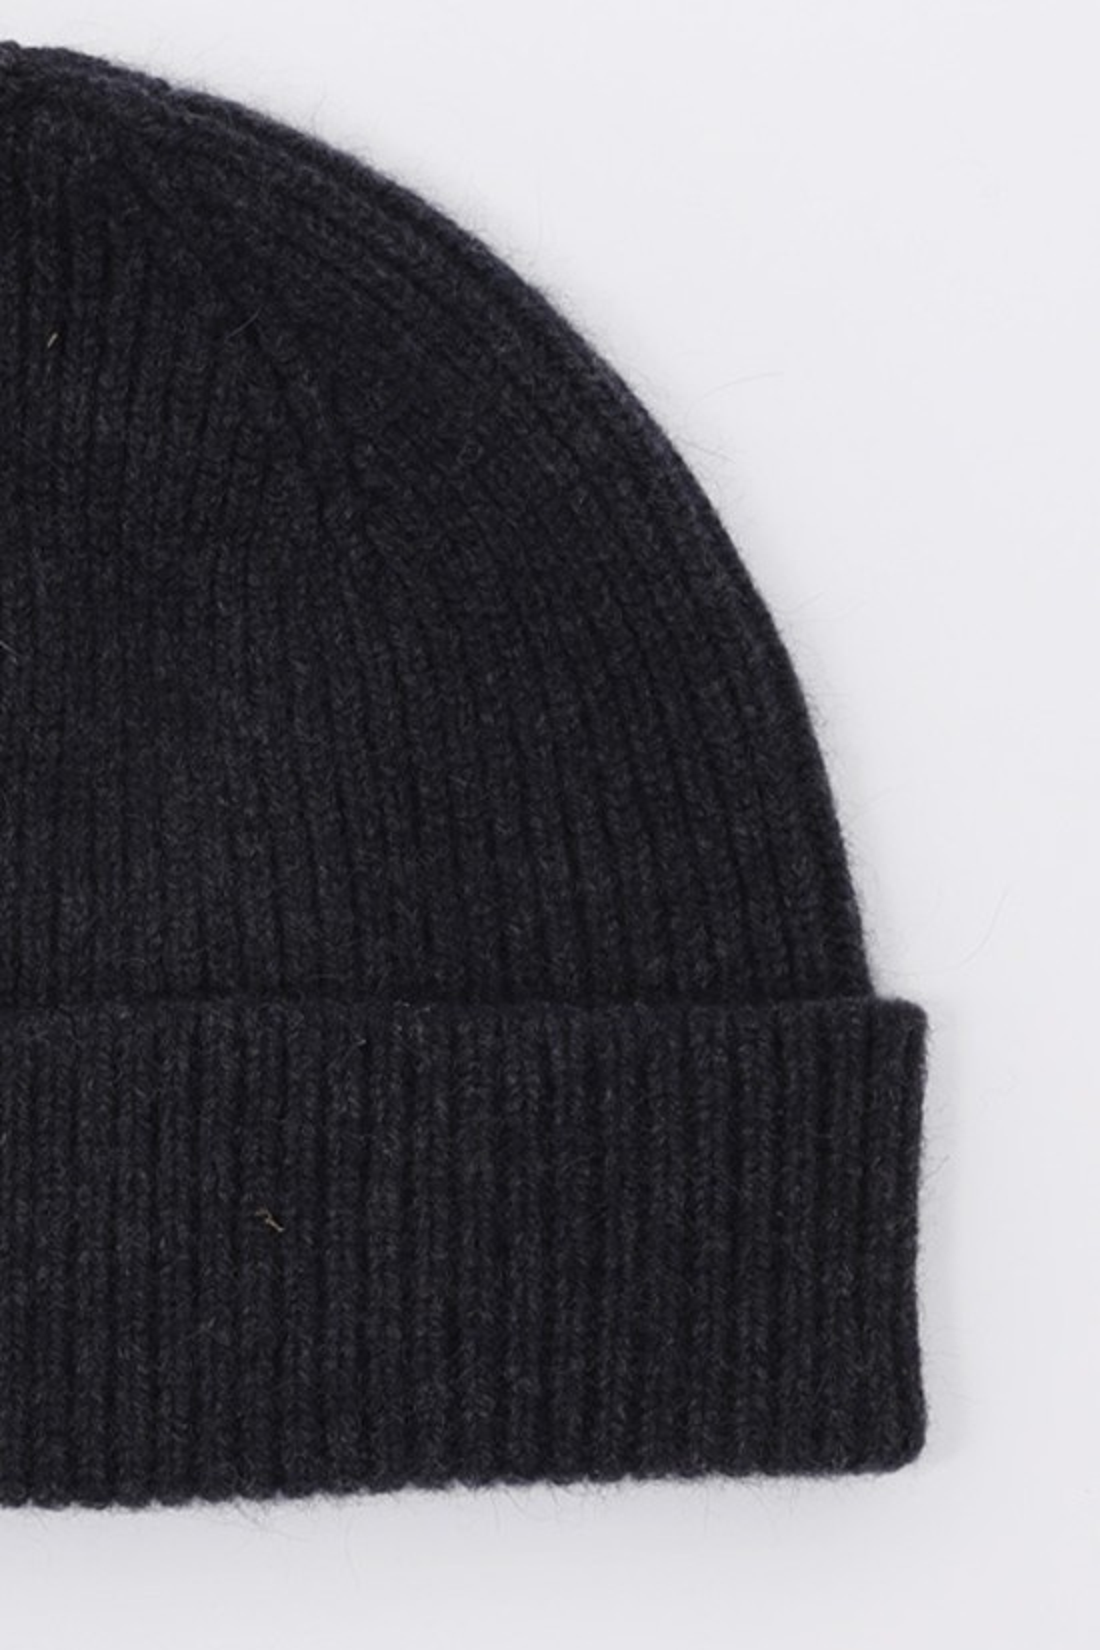 MACKIE / Barra hat Millstone